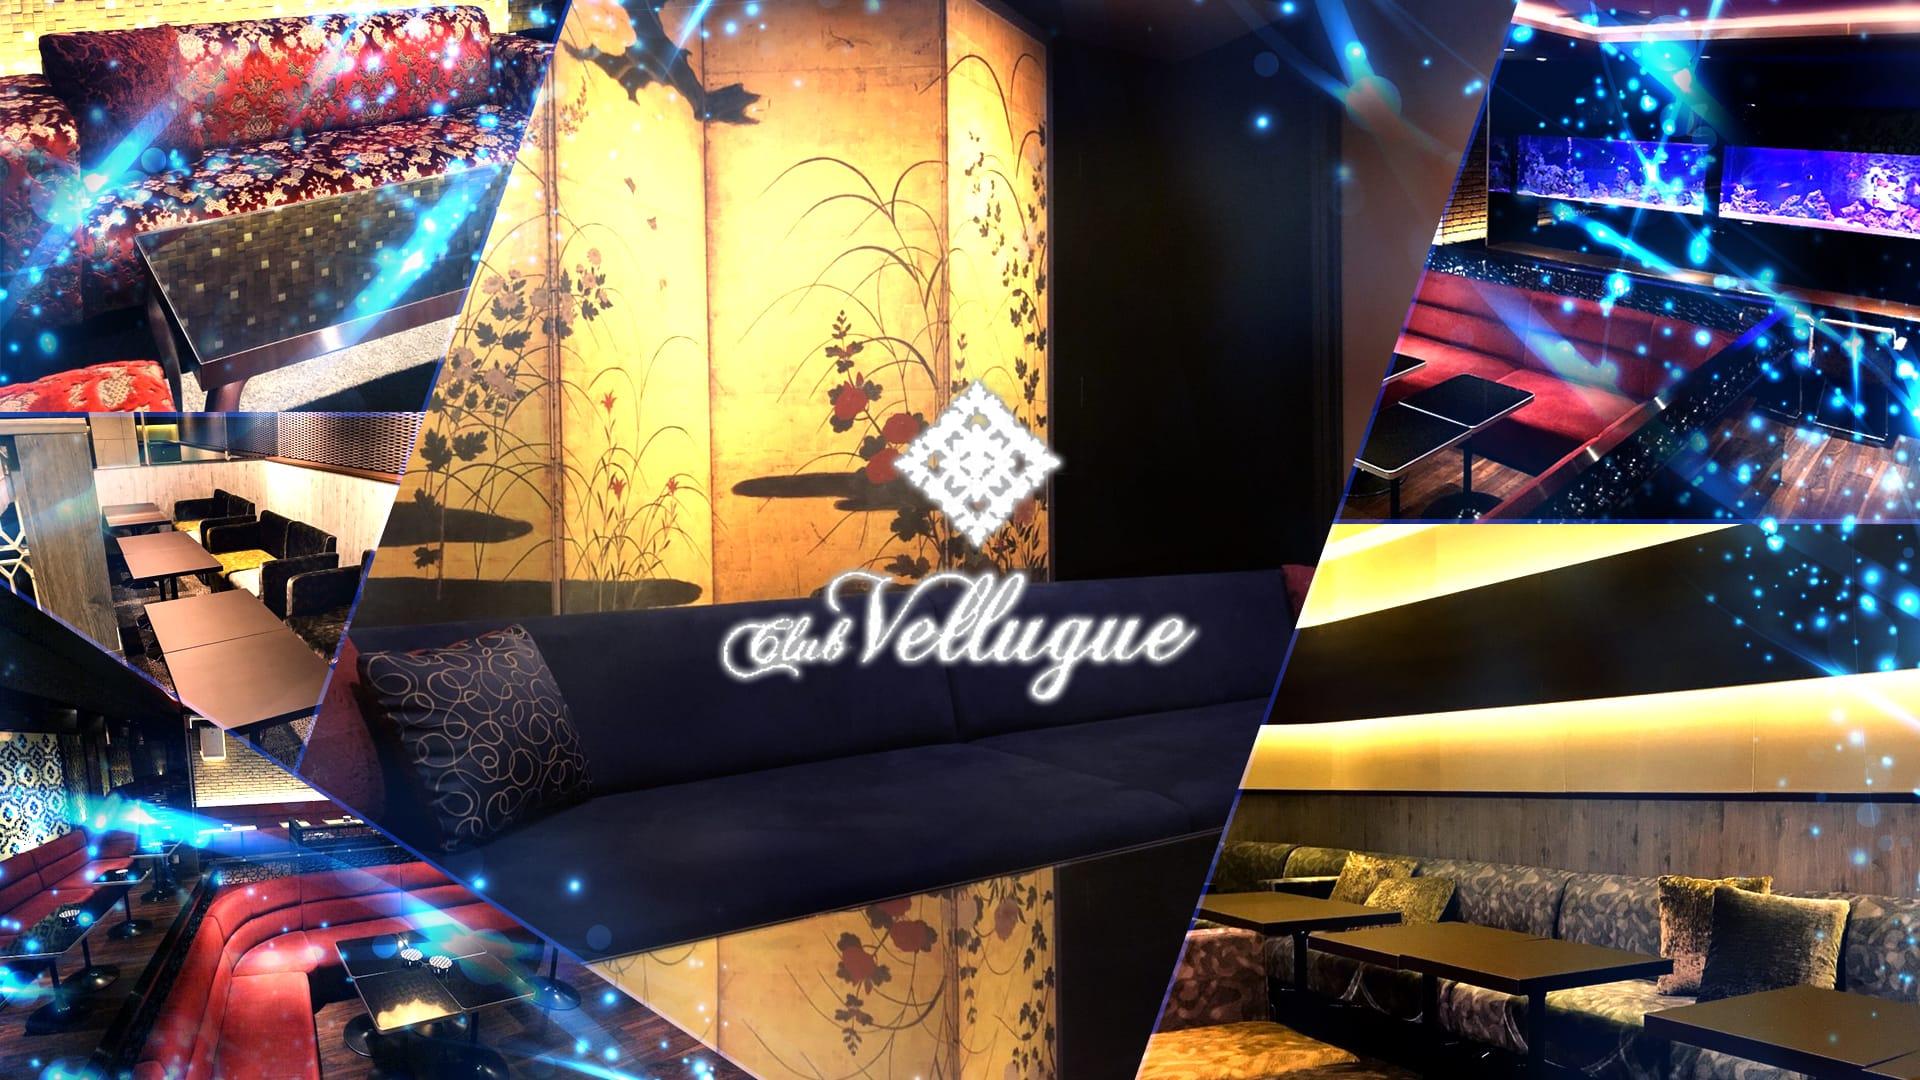 Vellugue(ヴェルージュ) 西船橋 キャバクラ TOP画像